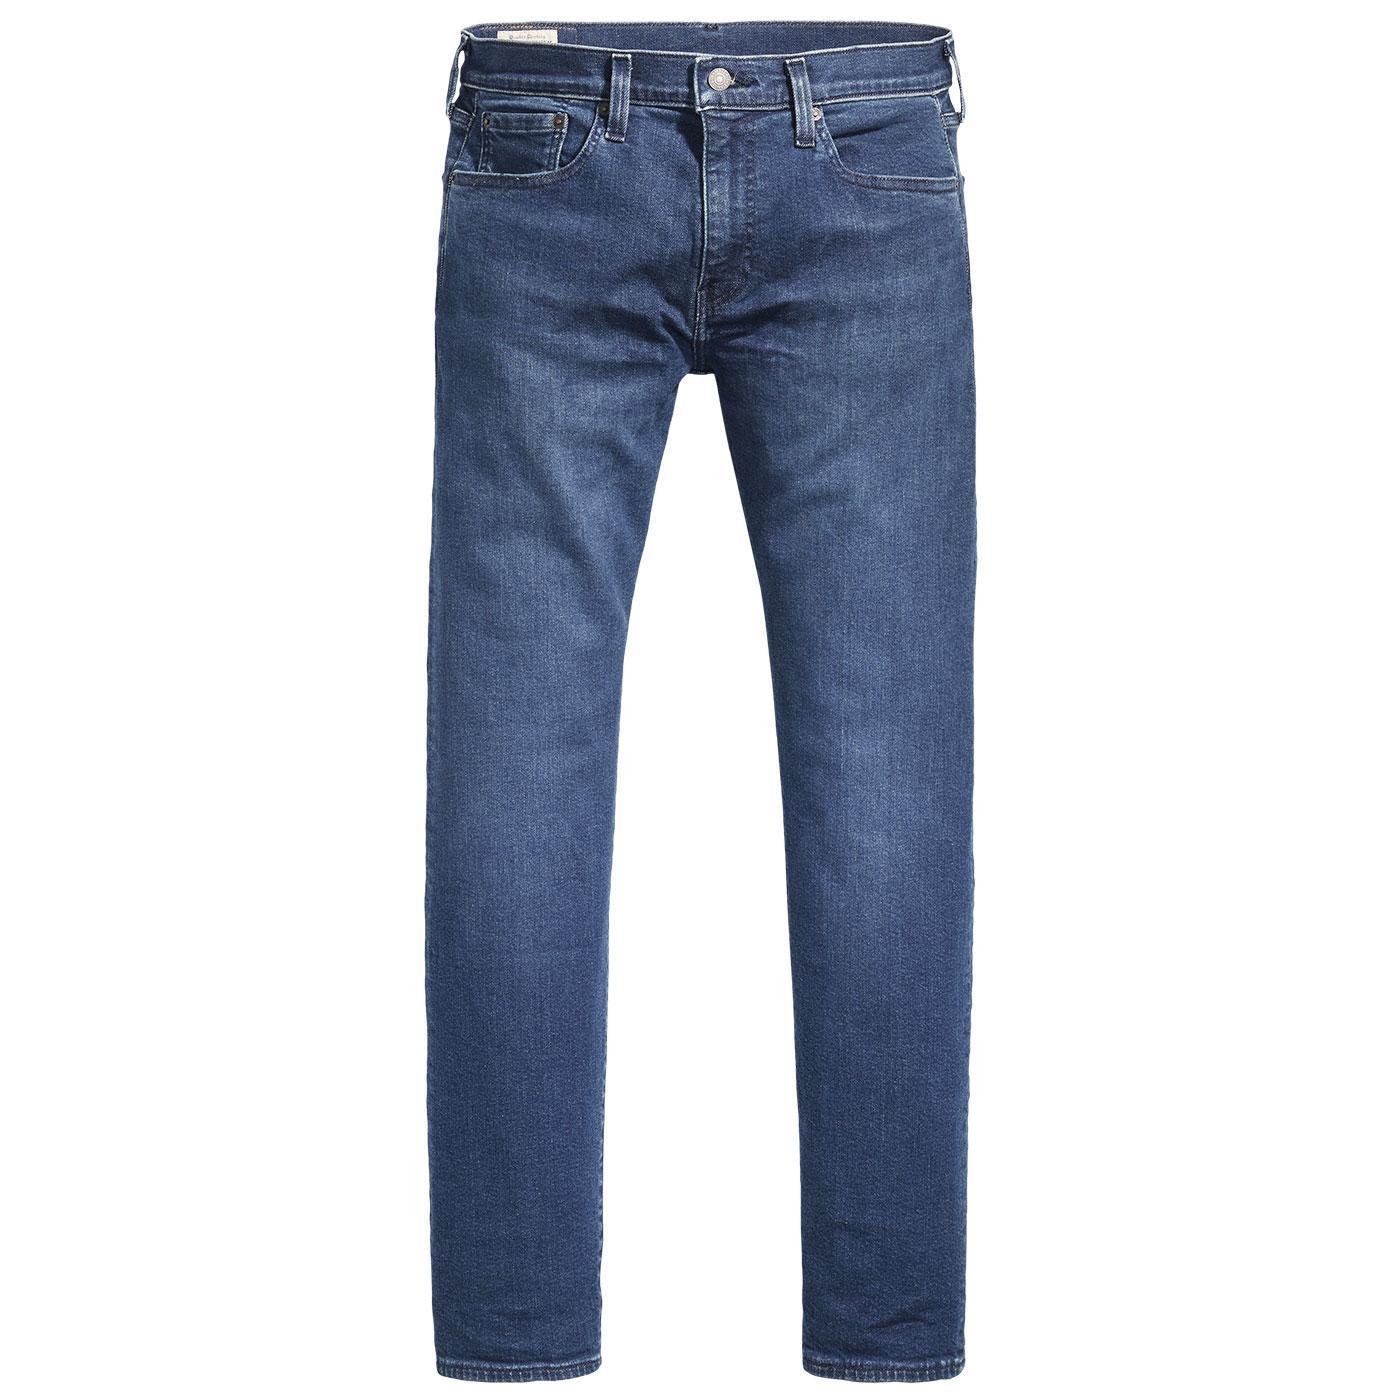 LEVI'S 502 Taper Jeans (Sage Super Nova Adv Tnl)